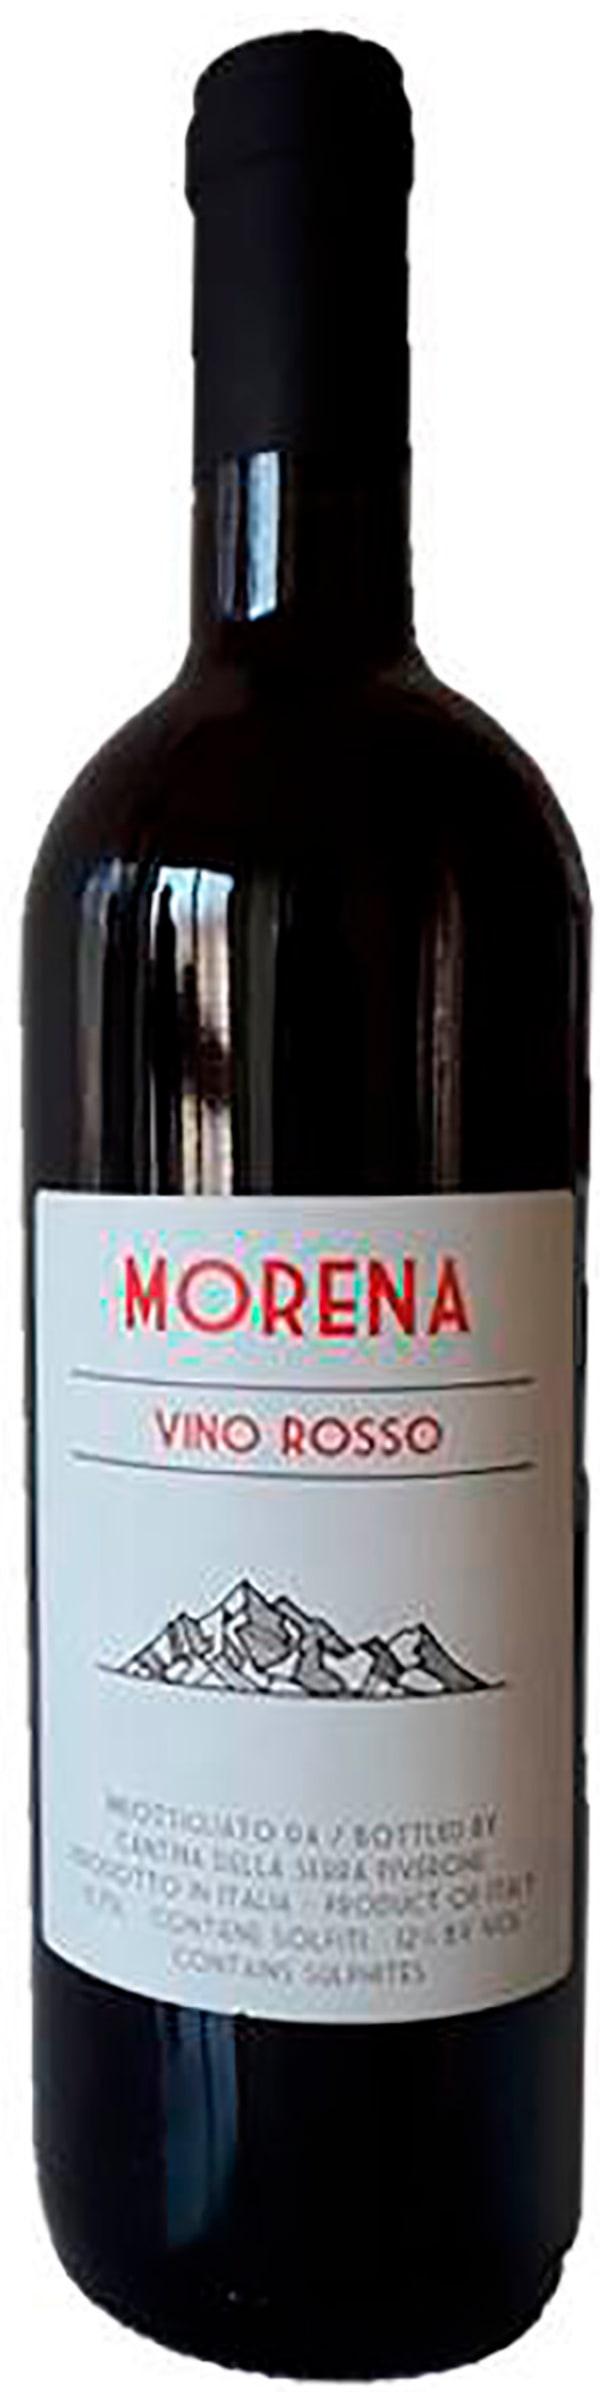 Morena Vino Rosso